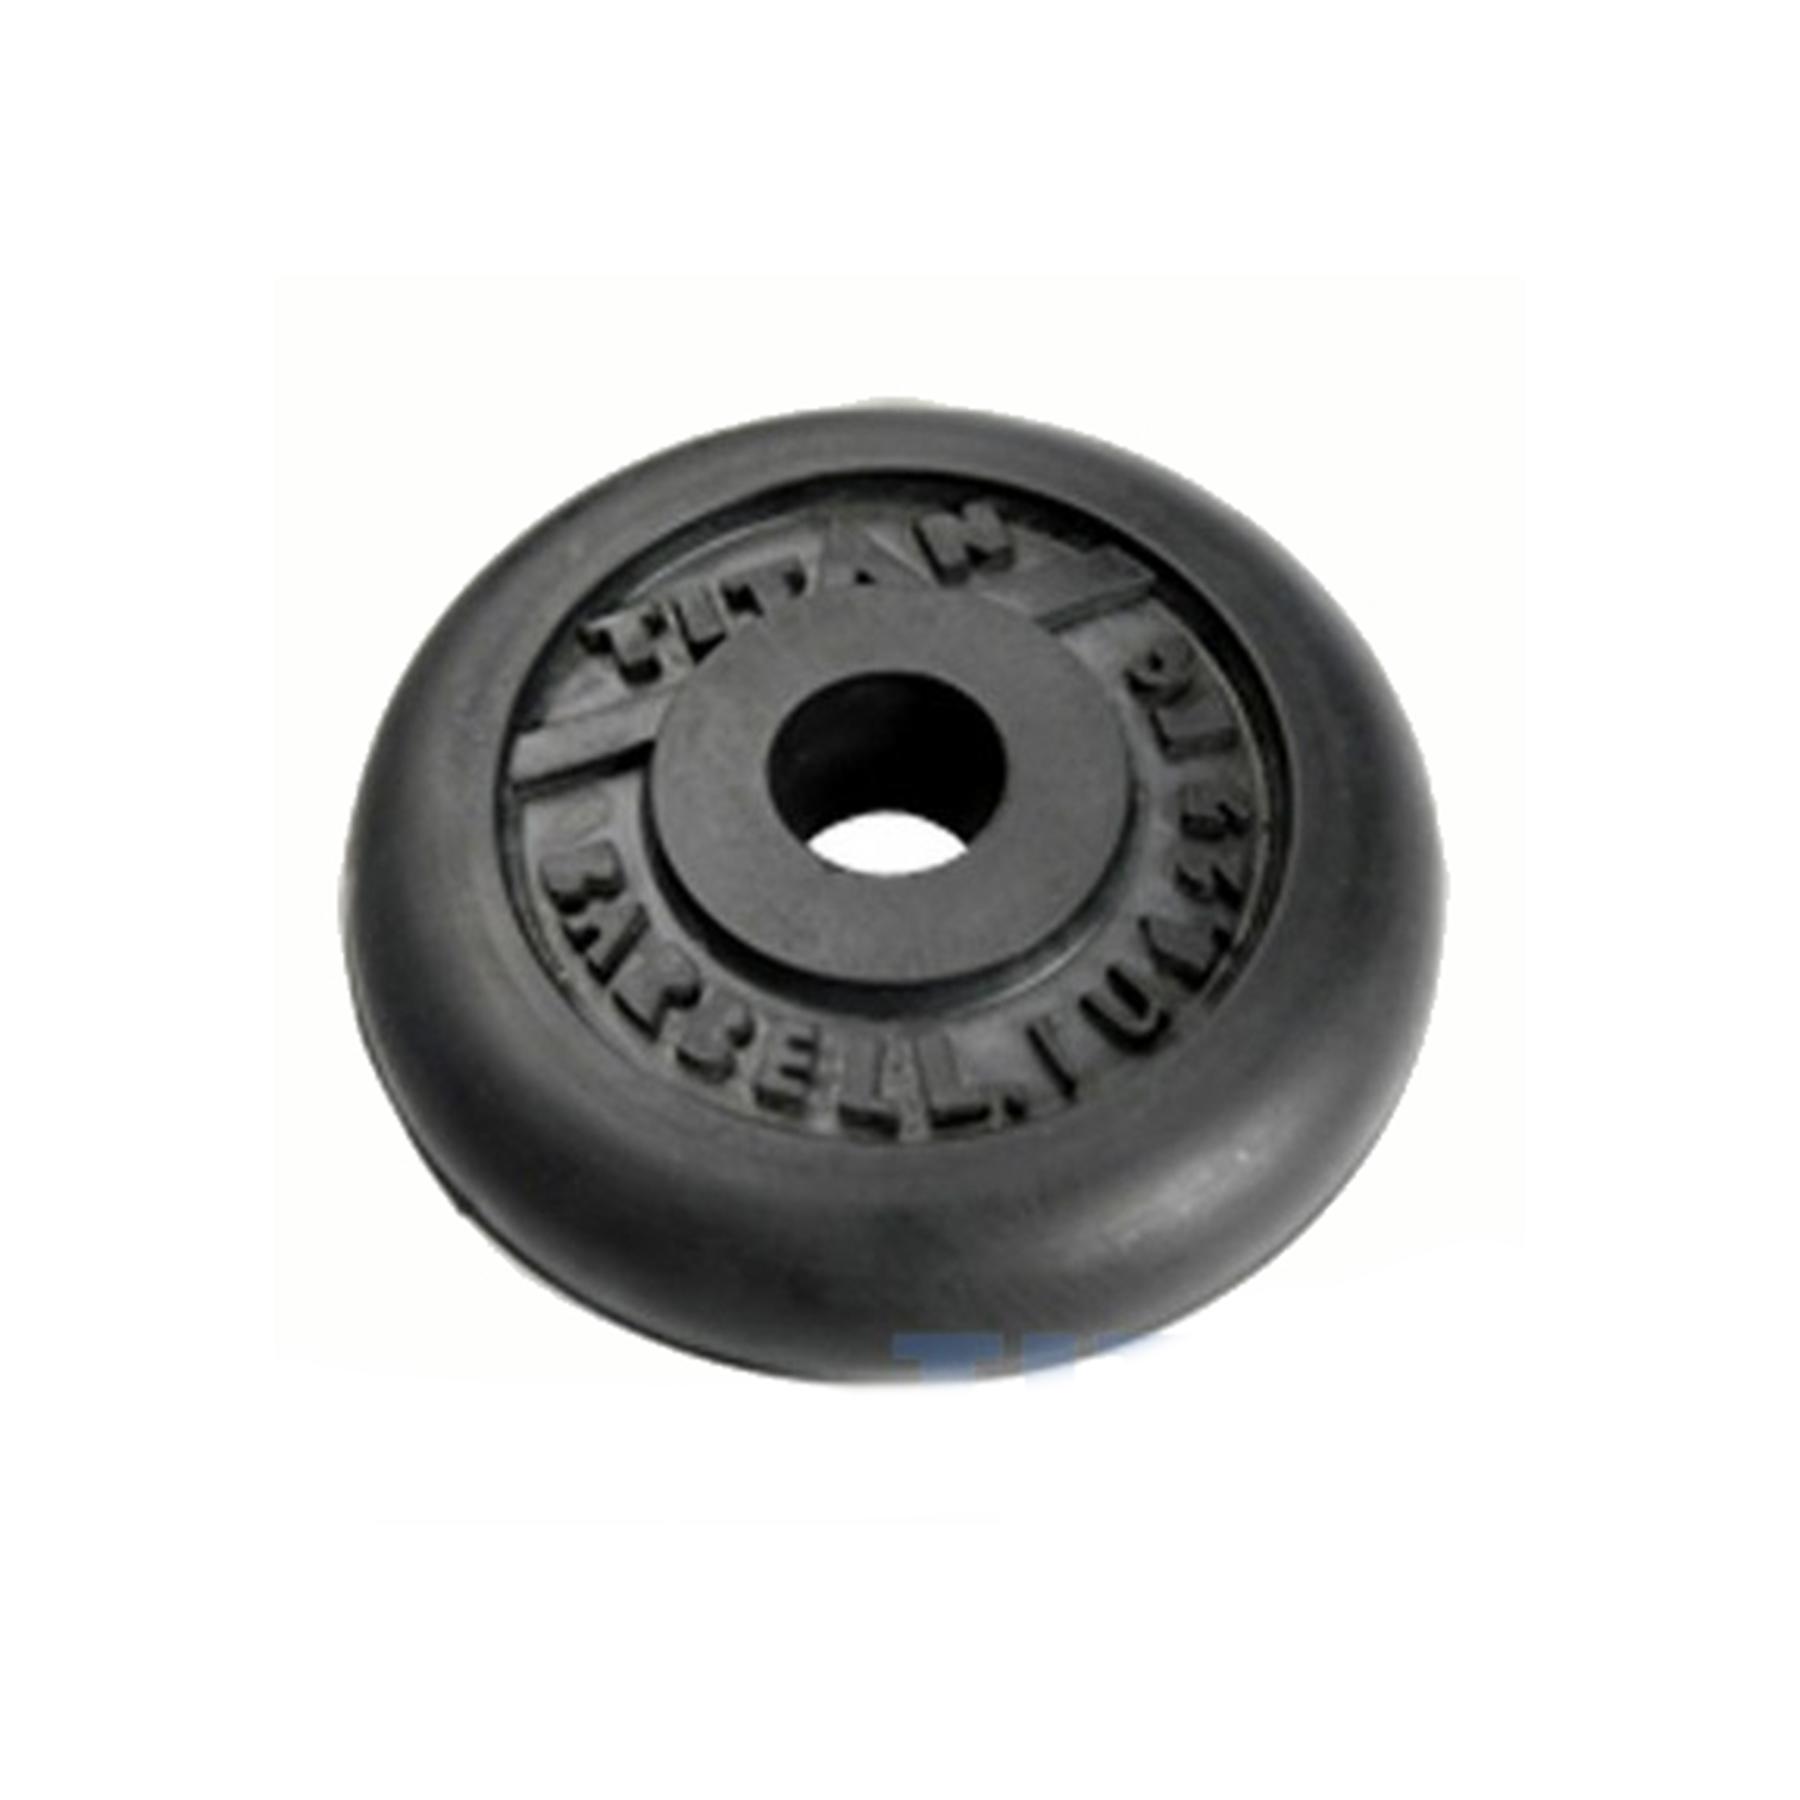 Диск обрез.чер. Титан d-26 mm.  1,25 кг.